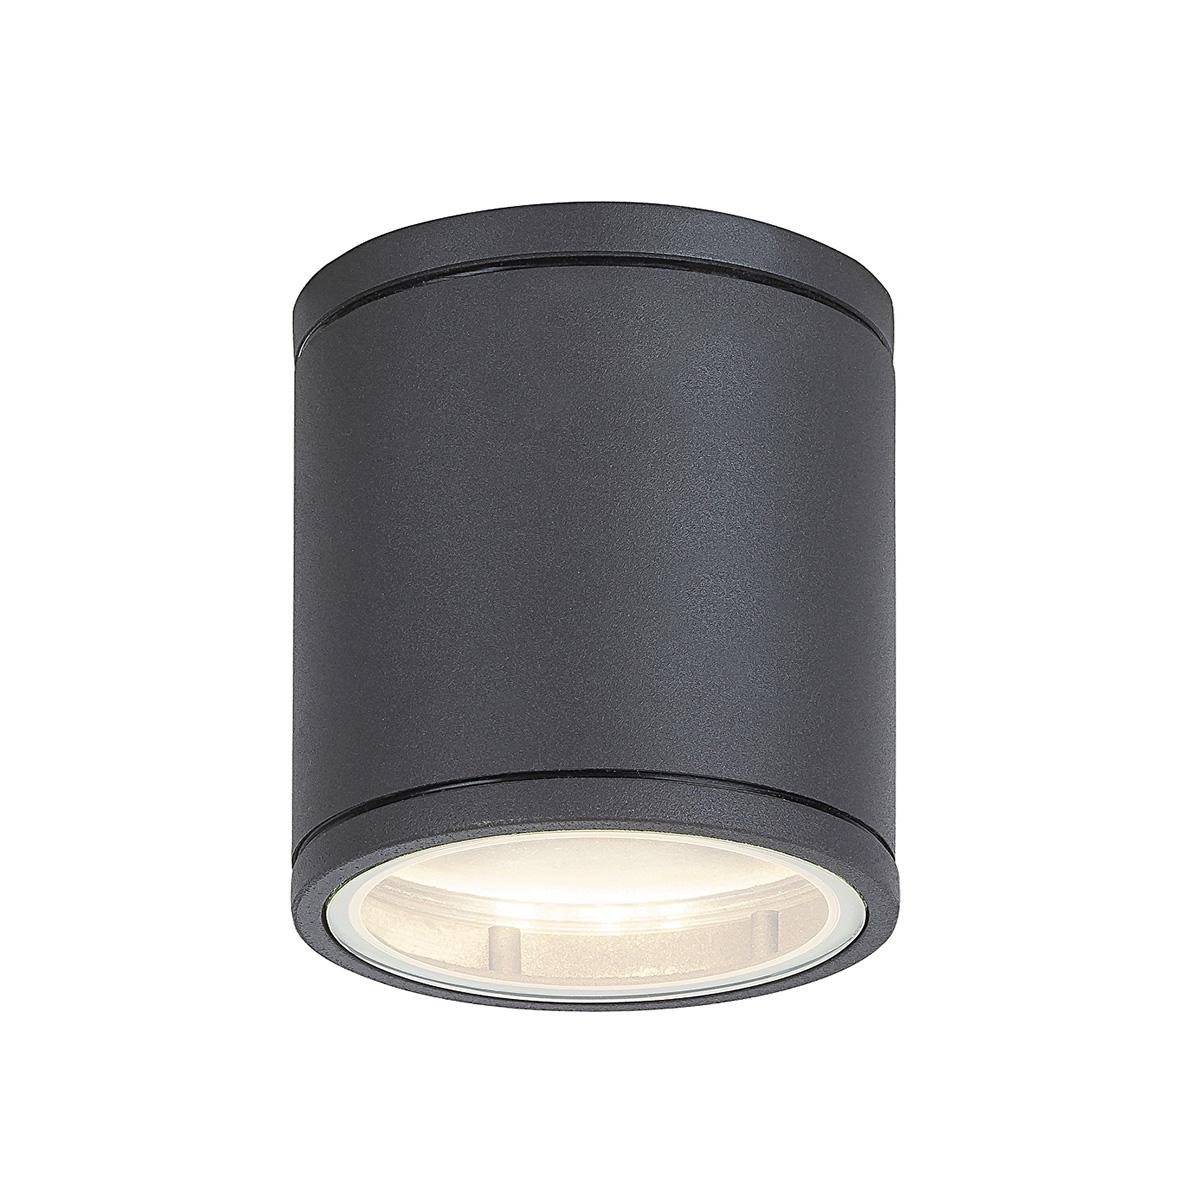 Zidna lampa Akron 8150 siva